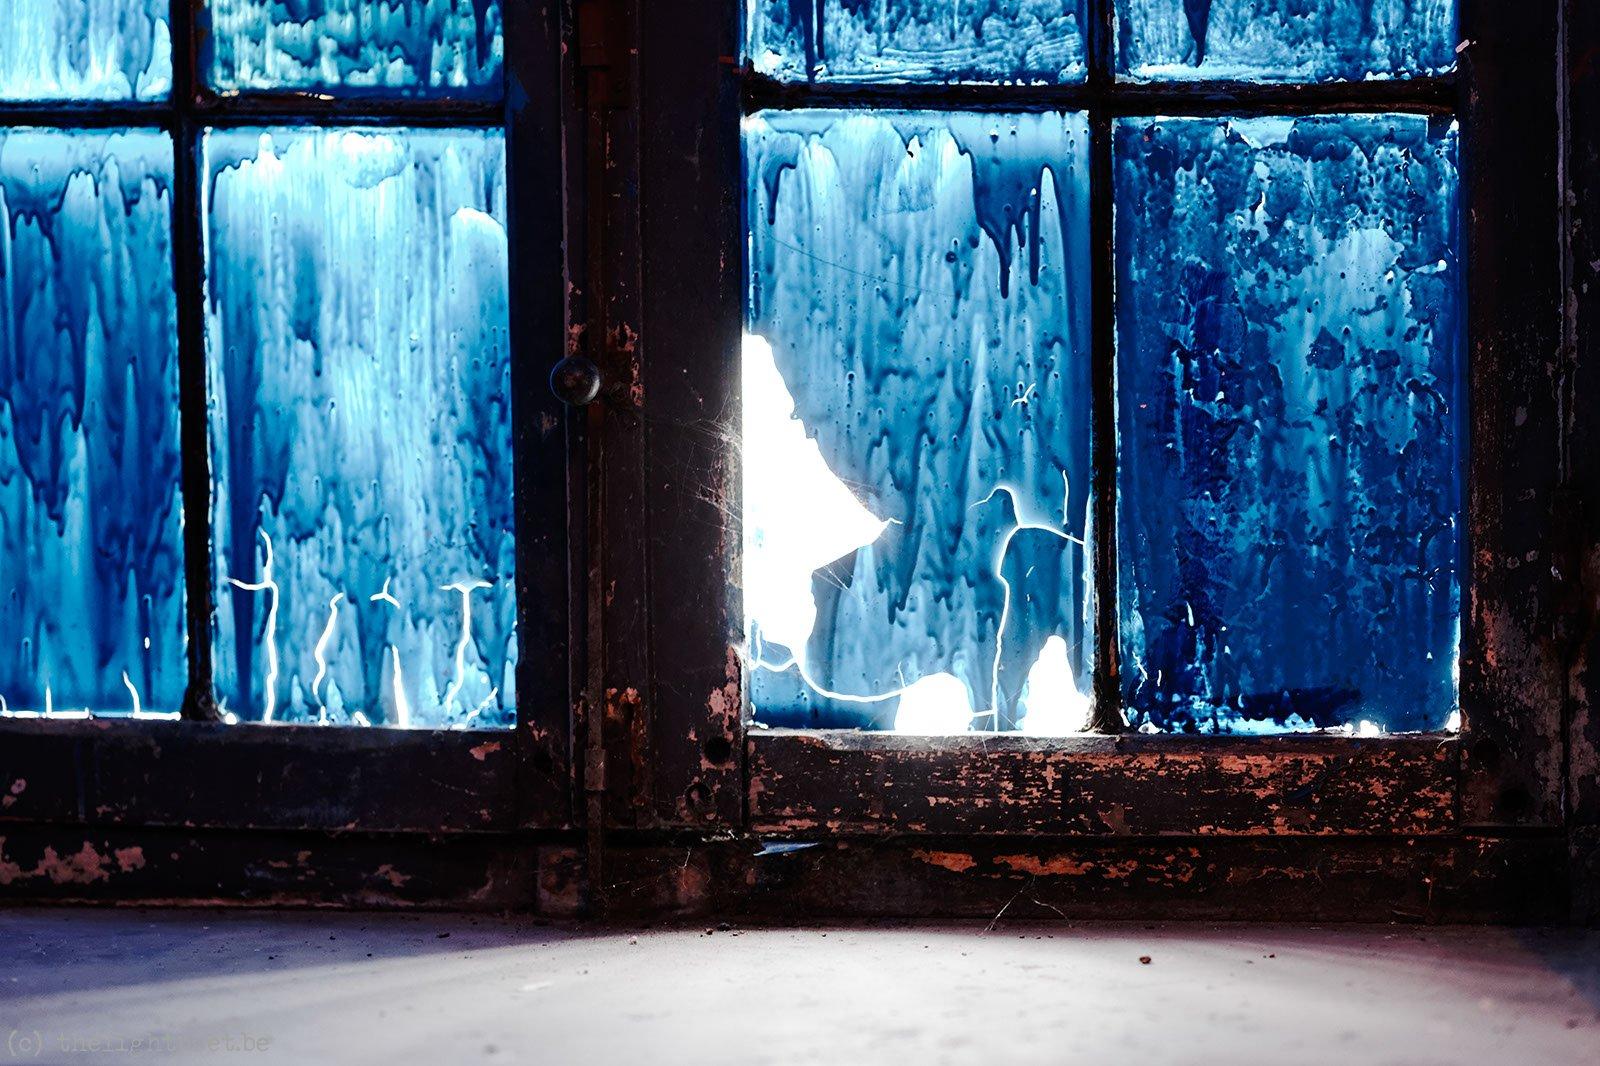 2010_12_breendonk_20101229_161404_dxo